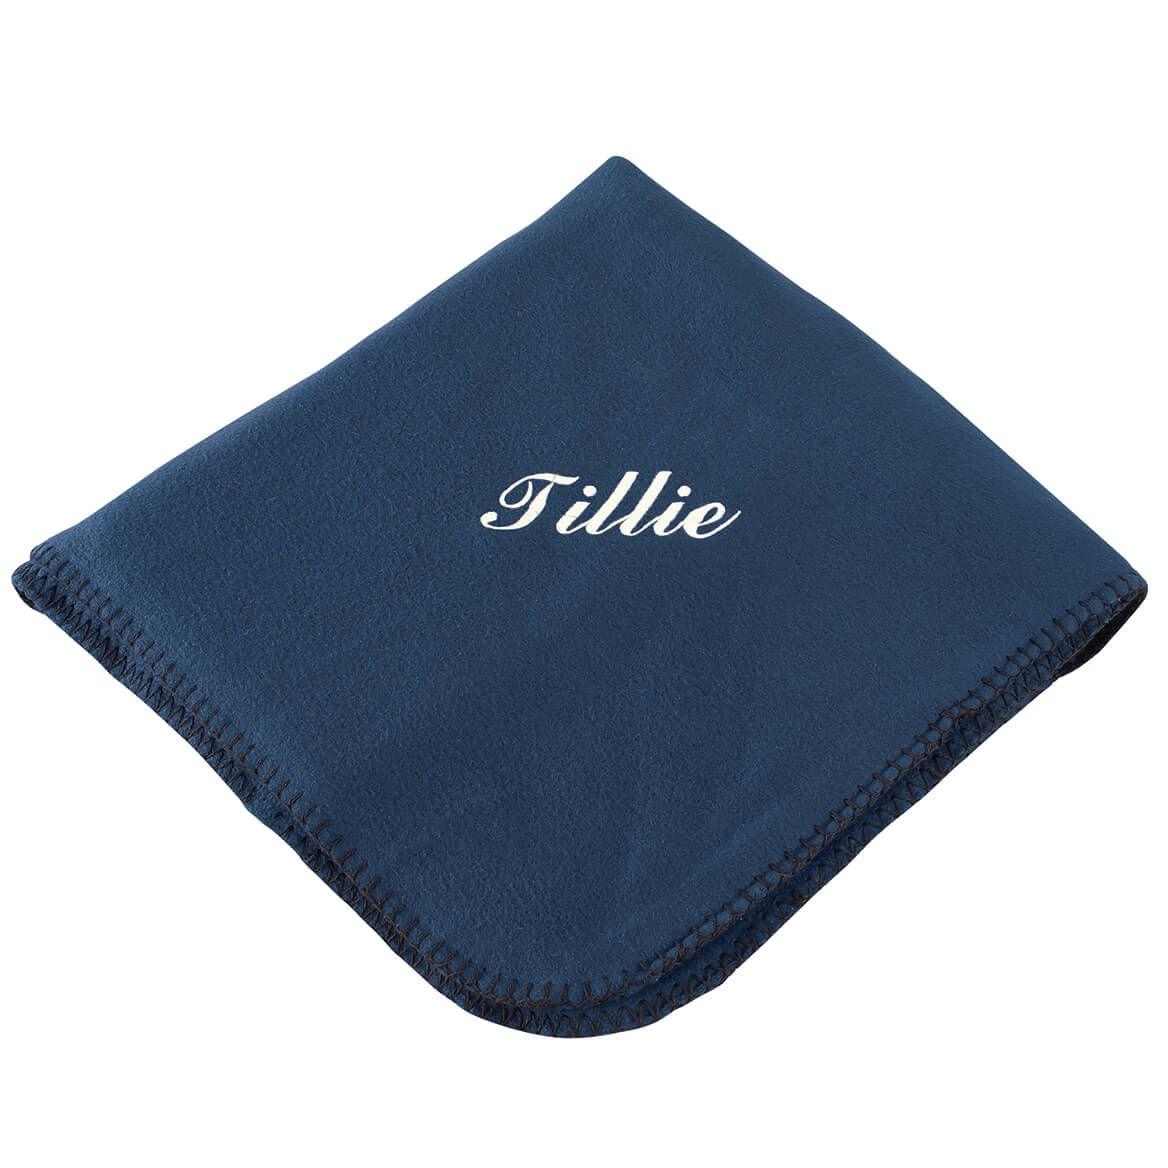 "Personalized Navy Fleece Blanket 50""x60""-369517"